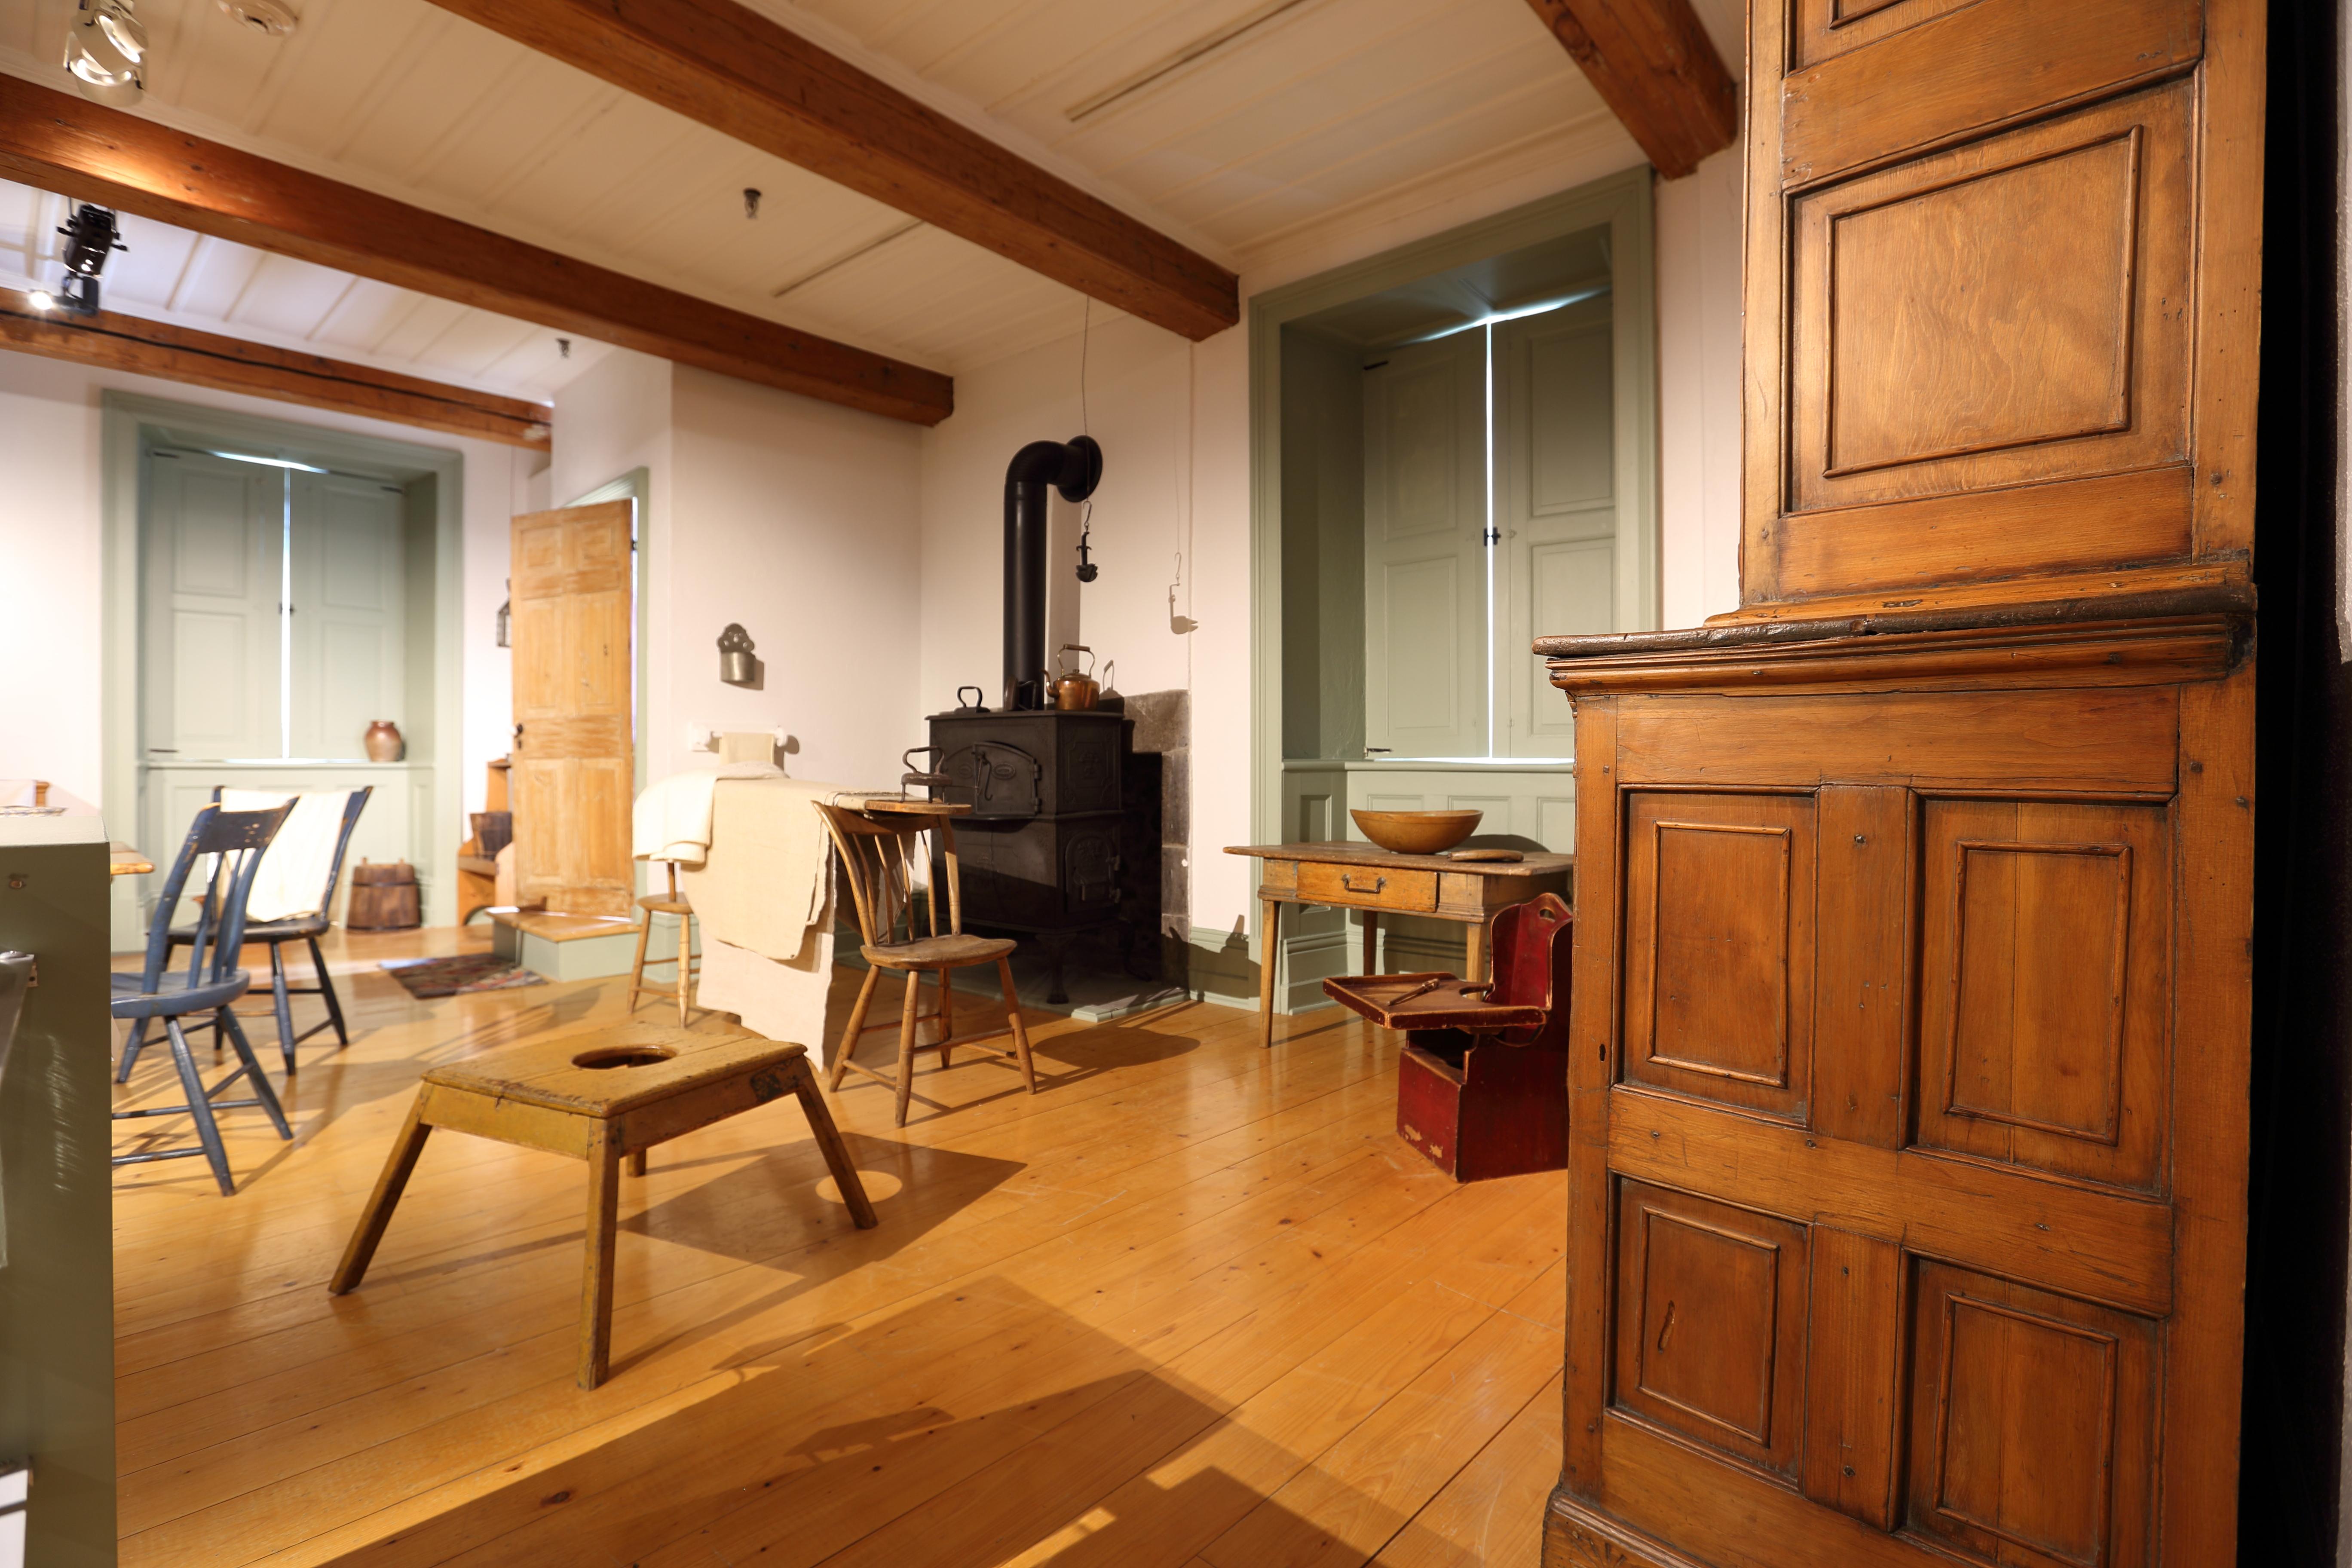 File:Maison Jean-Baptiste-Chevalier intérieur 08.jpg - Wikimedia Commons